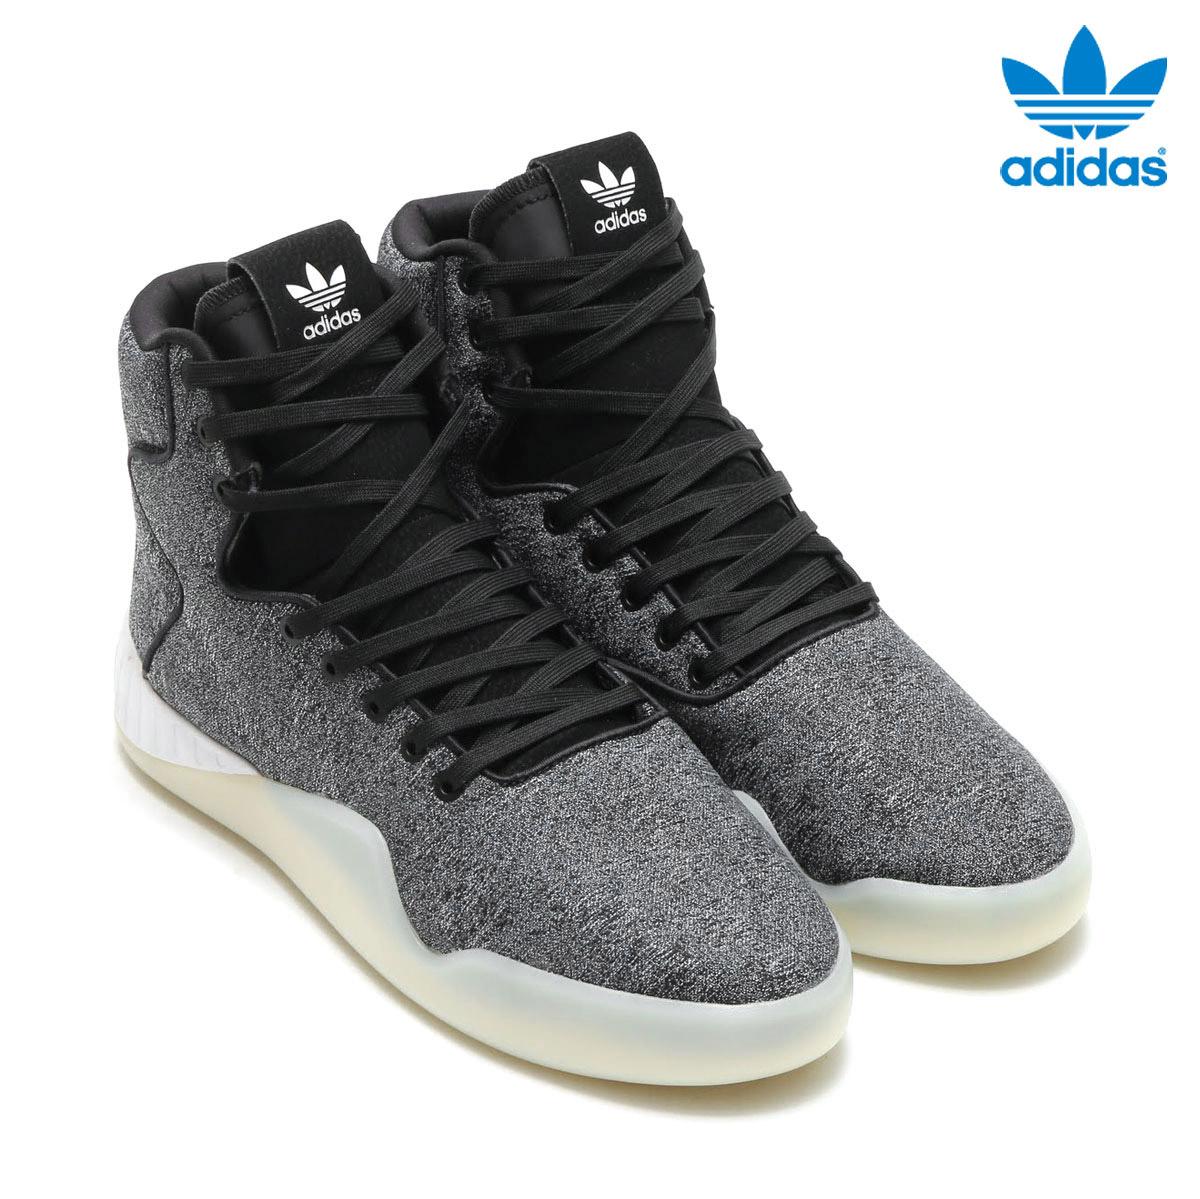 adidas Originals TUBULAR ISTNT JC(アディダス オリジナルス チューブラー インスティンクト JC)(Core Black/Crystal White/Running White) 【メンズサイズ】17SS-I